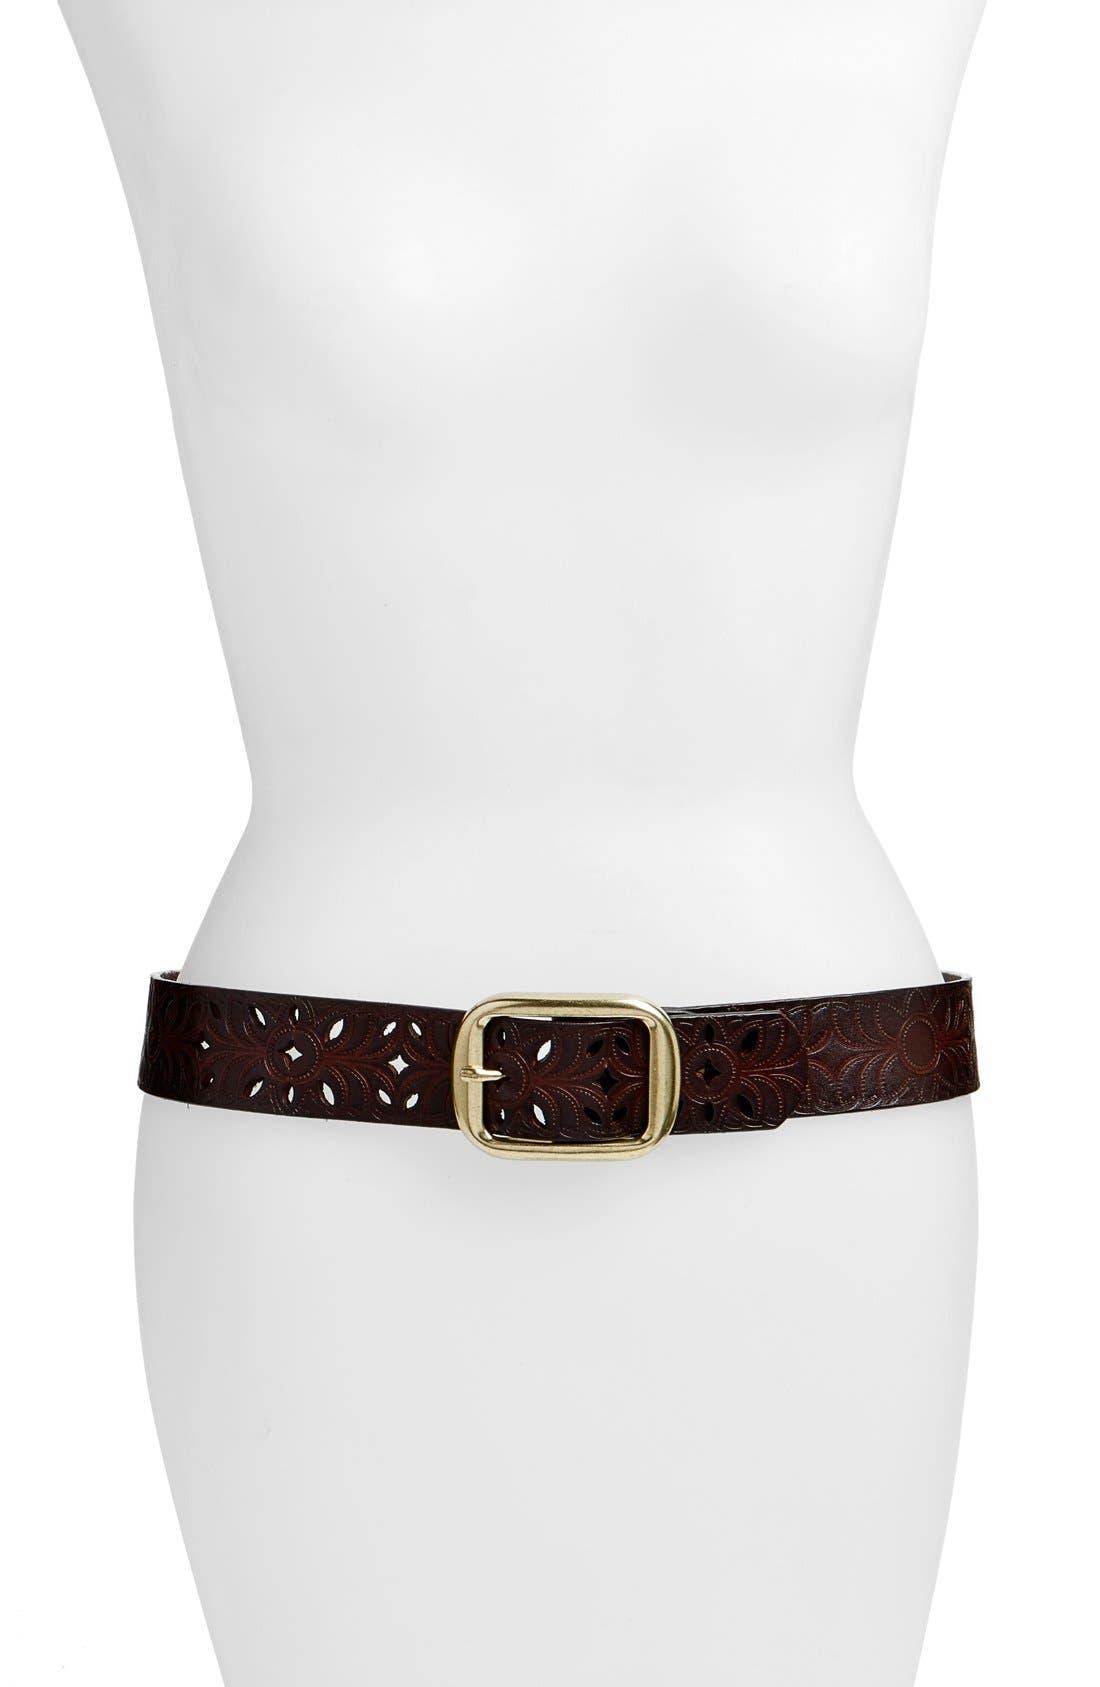 Elise M. 'Cantina' Leather Hip Belt